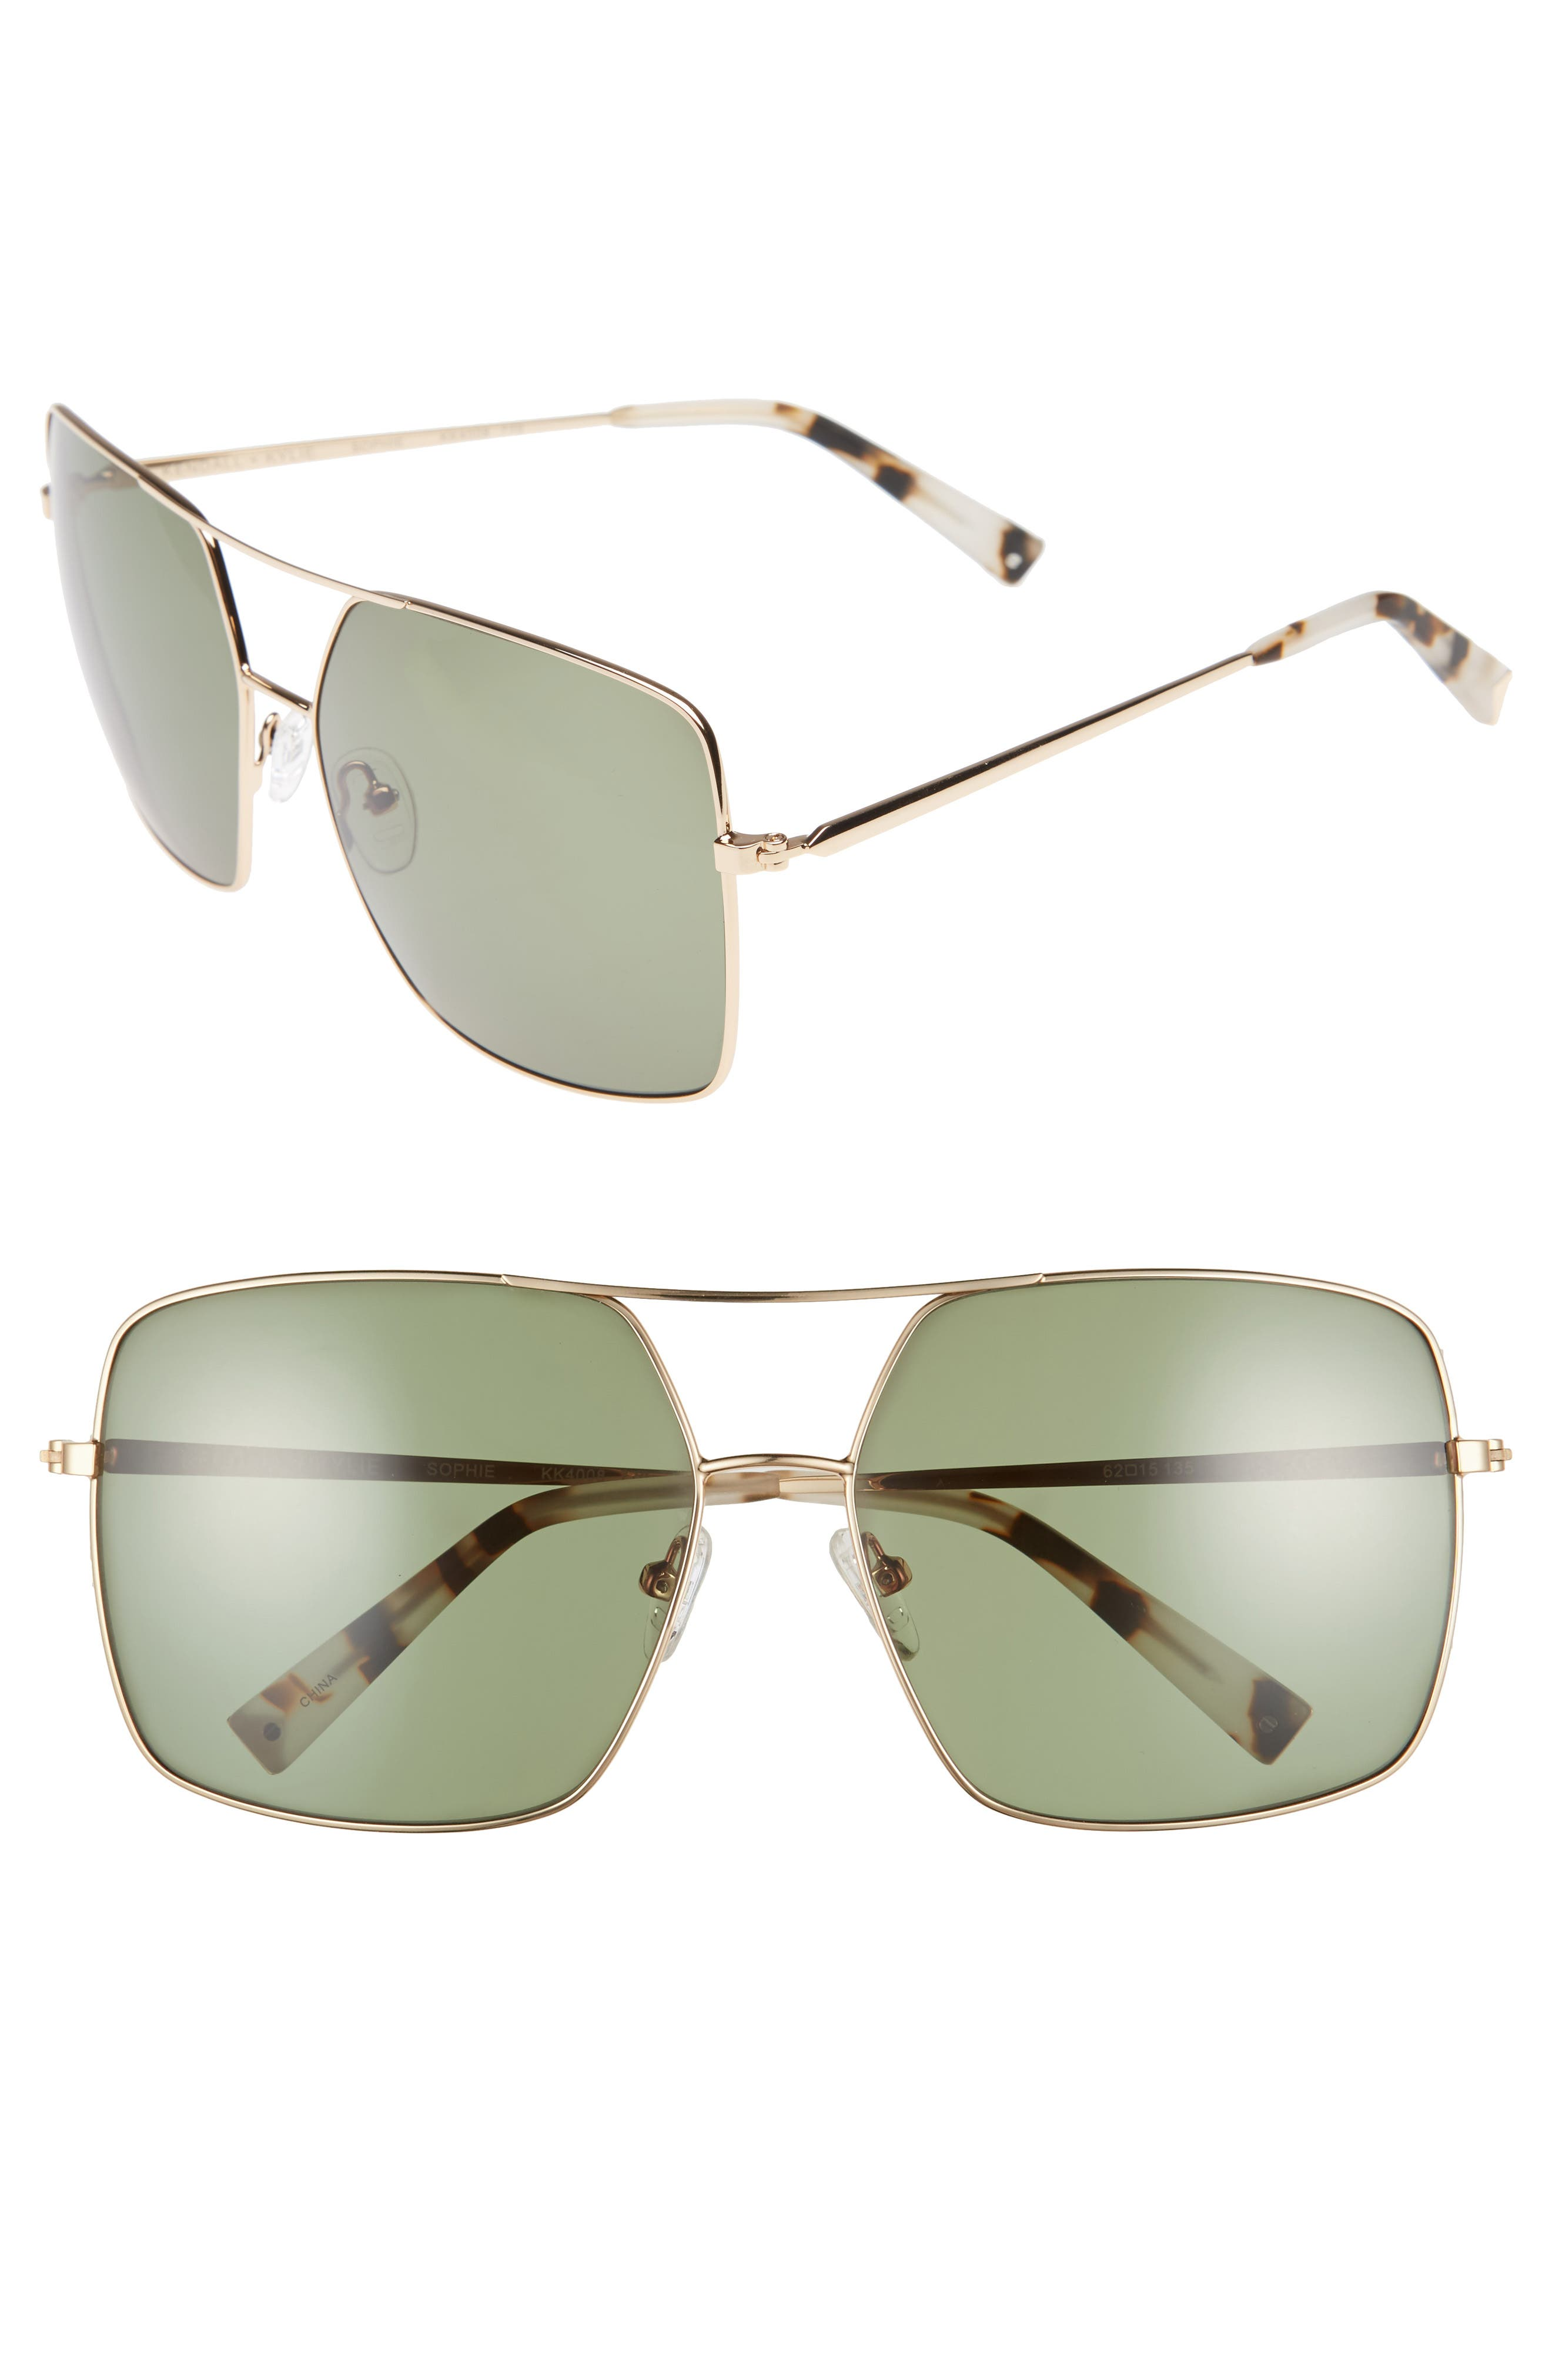 65mm Navigator Sunglasses,                         Main,                         color, Gold/ Green